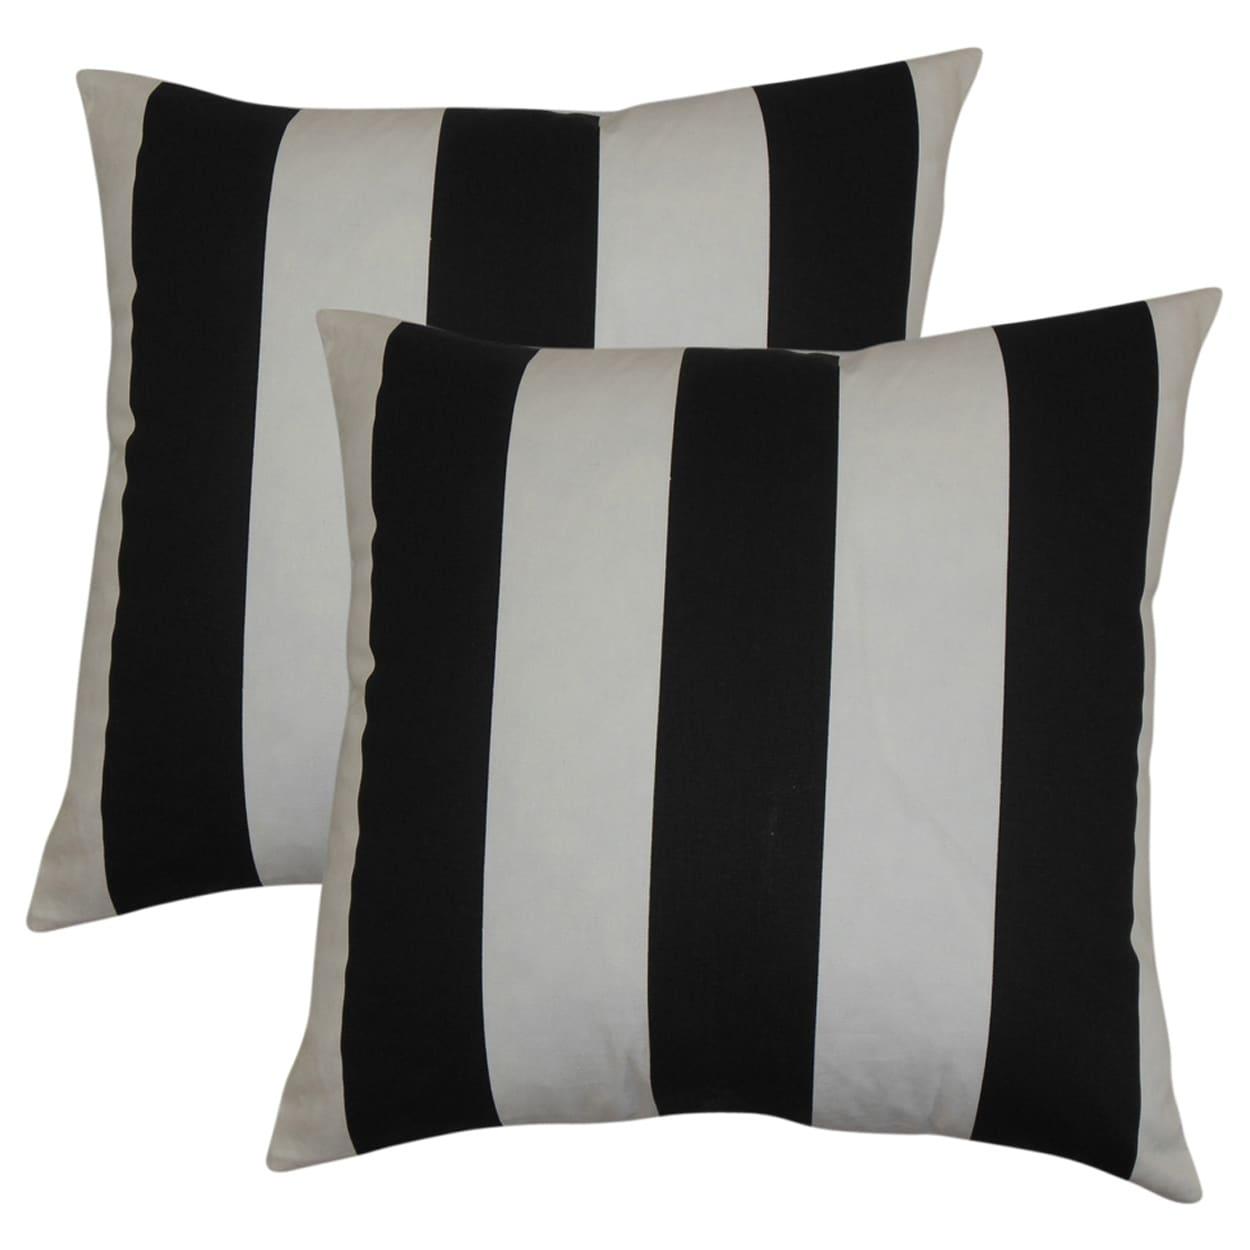 74e9b4be9df Set of 2 Leesburg Stripes Throw Pillows in Black White 653552344698 ...